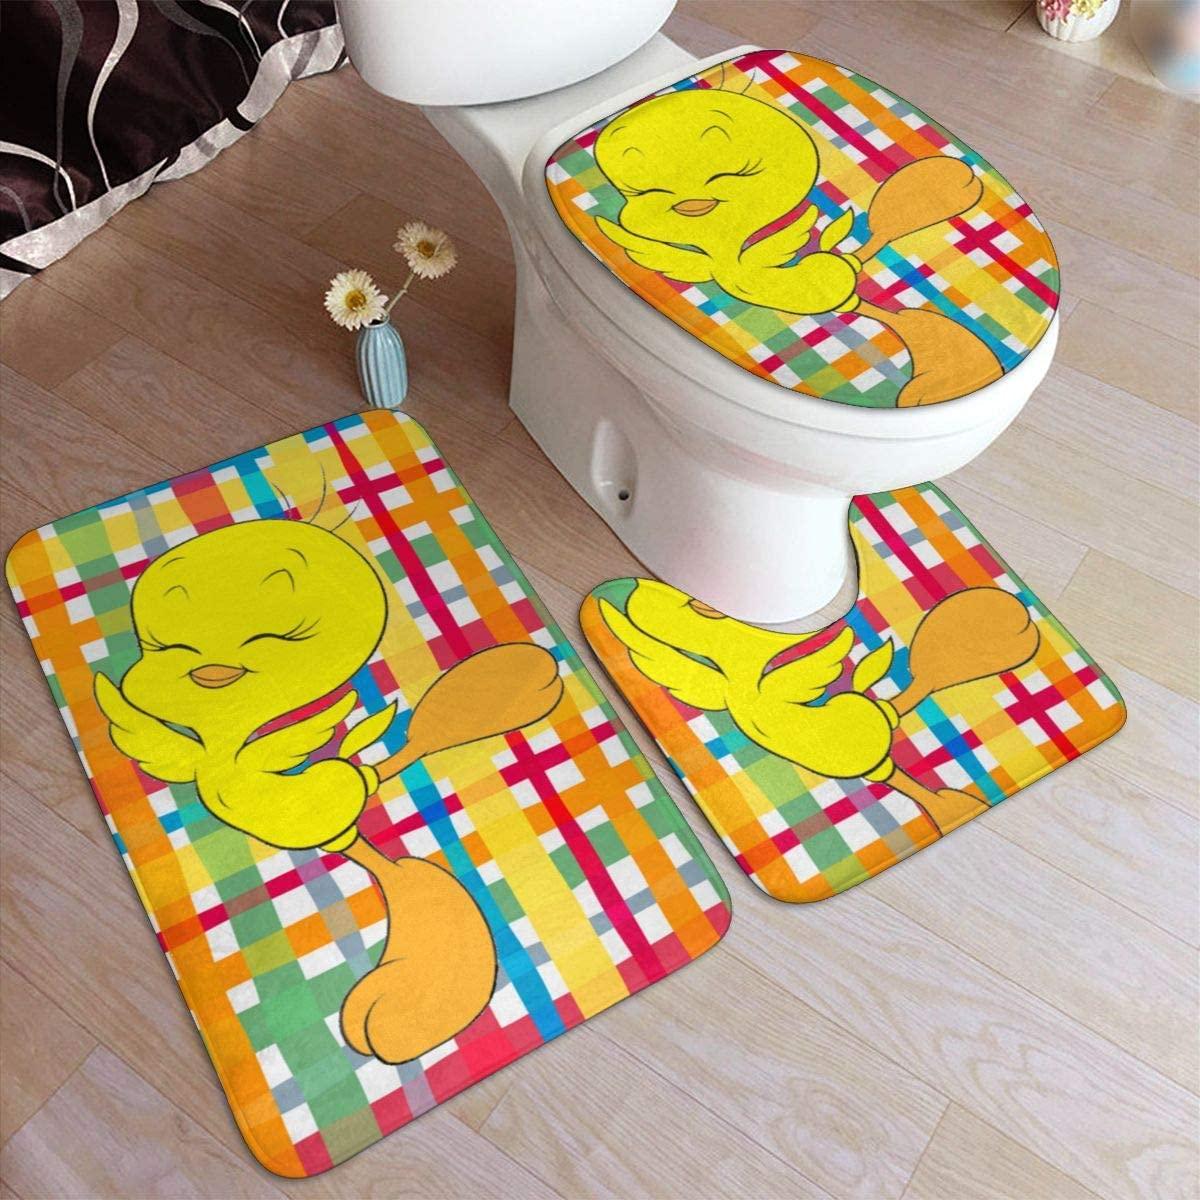 NYF Tweety Bird Bathroom Mat 3 Piece Set,Home Decoration Anti-Skid Pad+ Contour Mat + Toilet Lid Cover for Tub Shower Bathroom